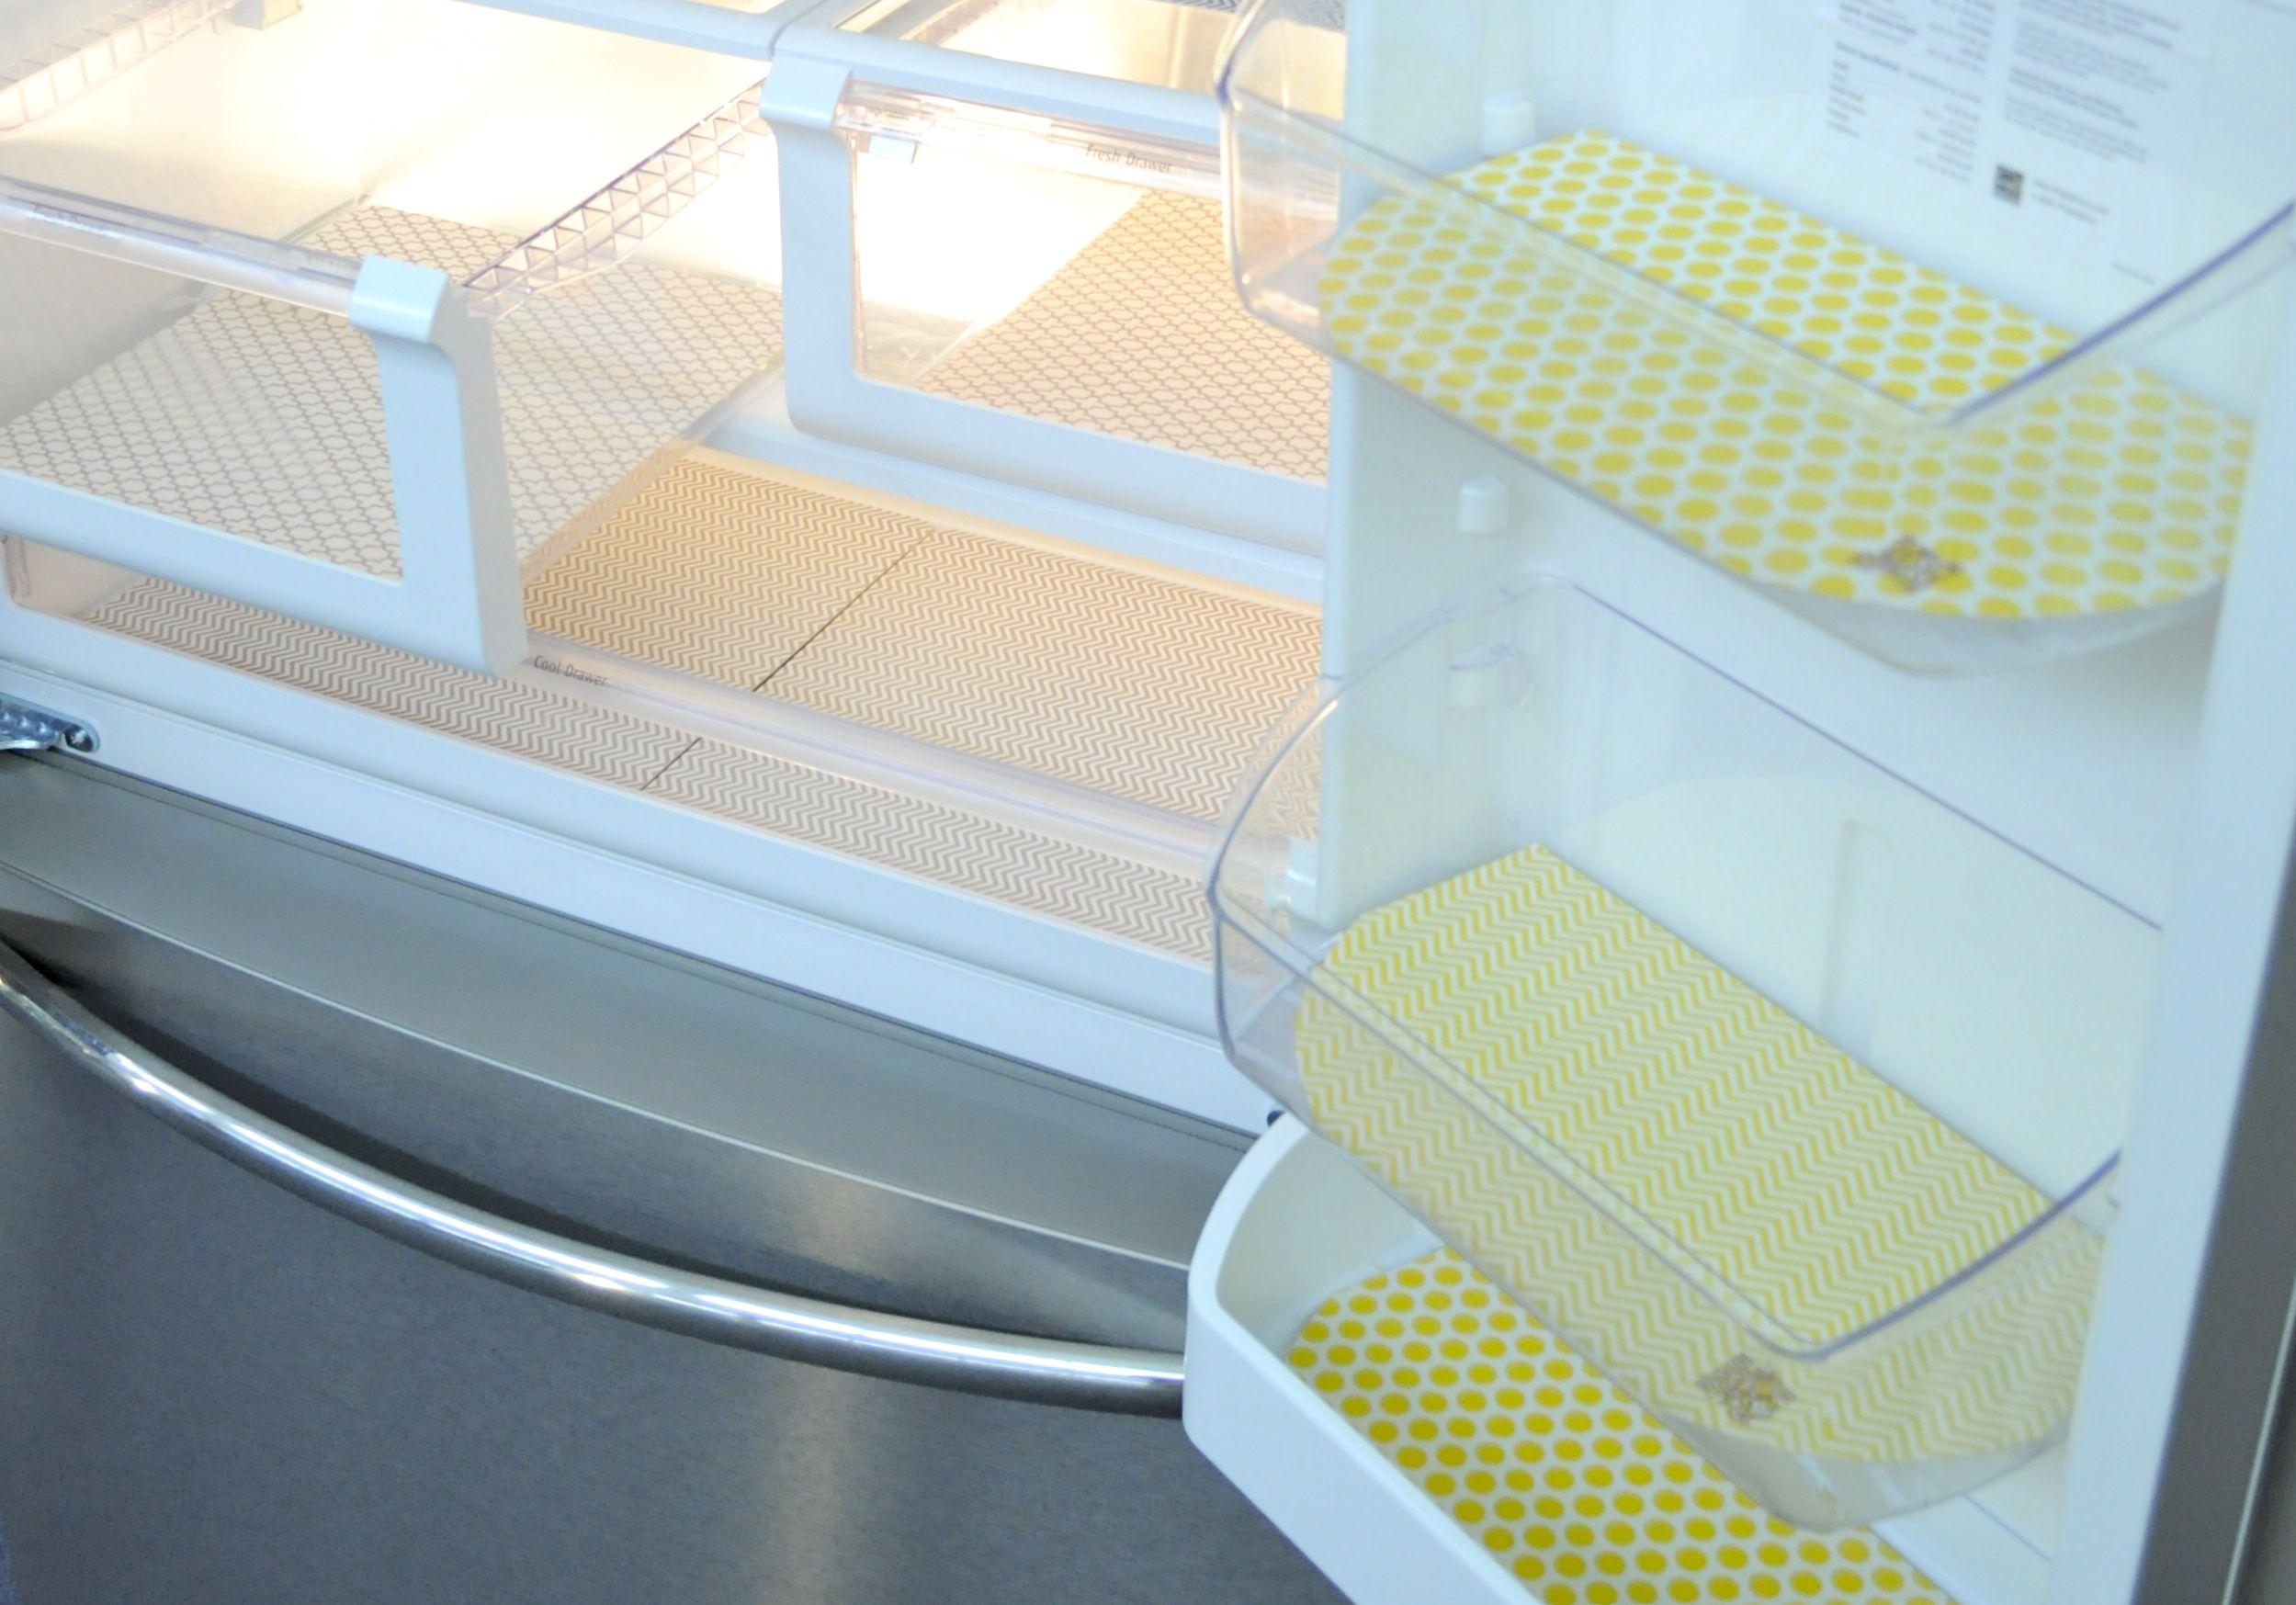 fun Fridge Coasters to keep my new fridge clean. | Inside the fridge ...